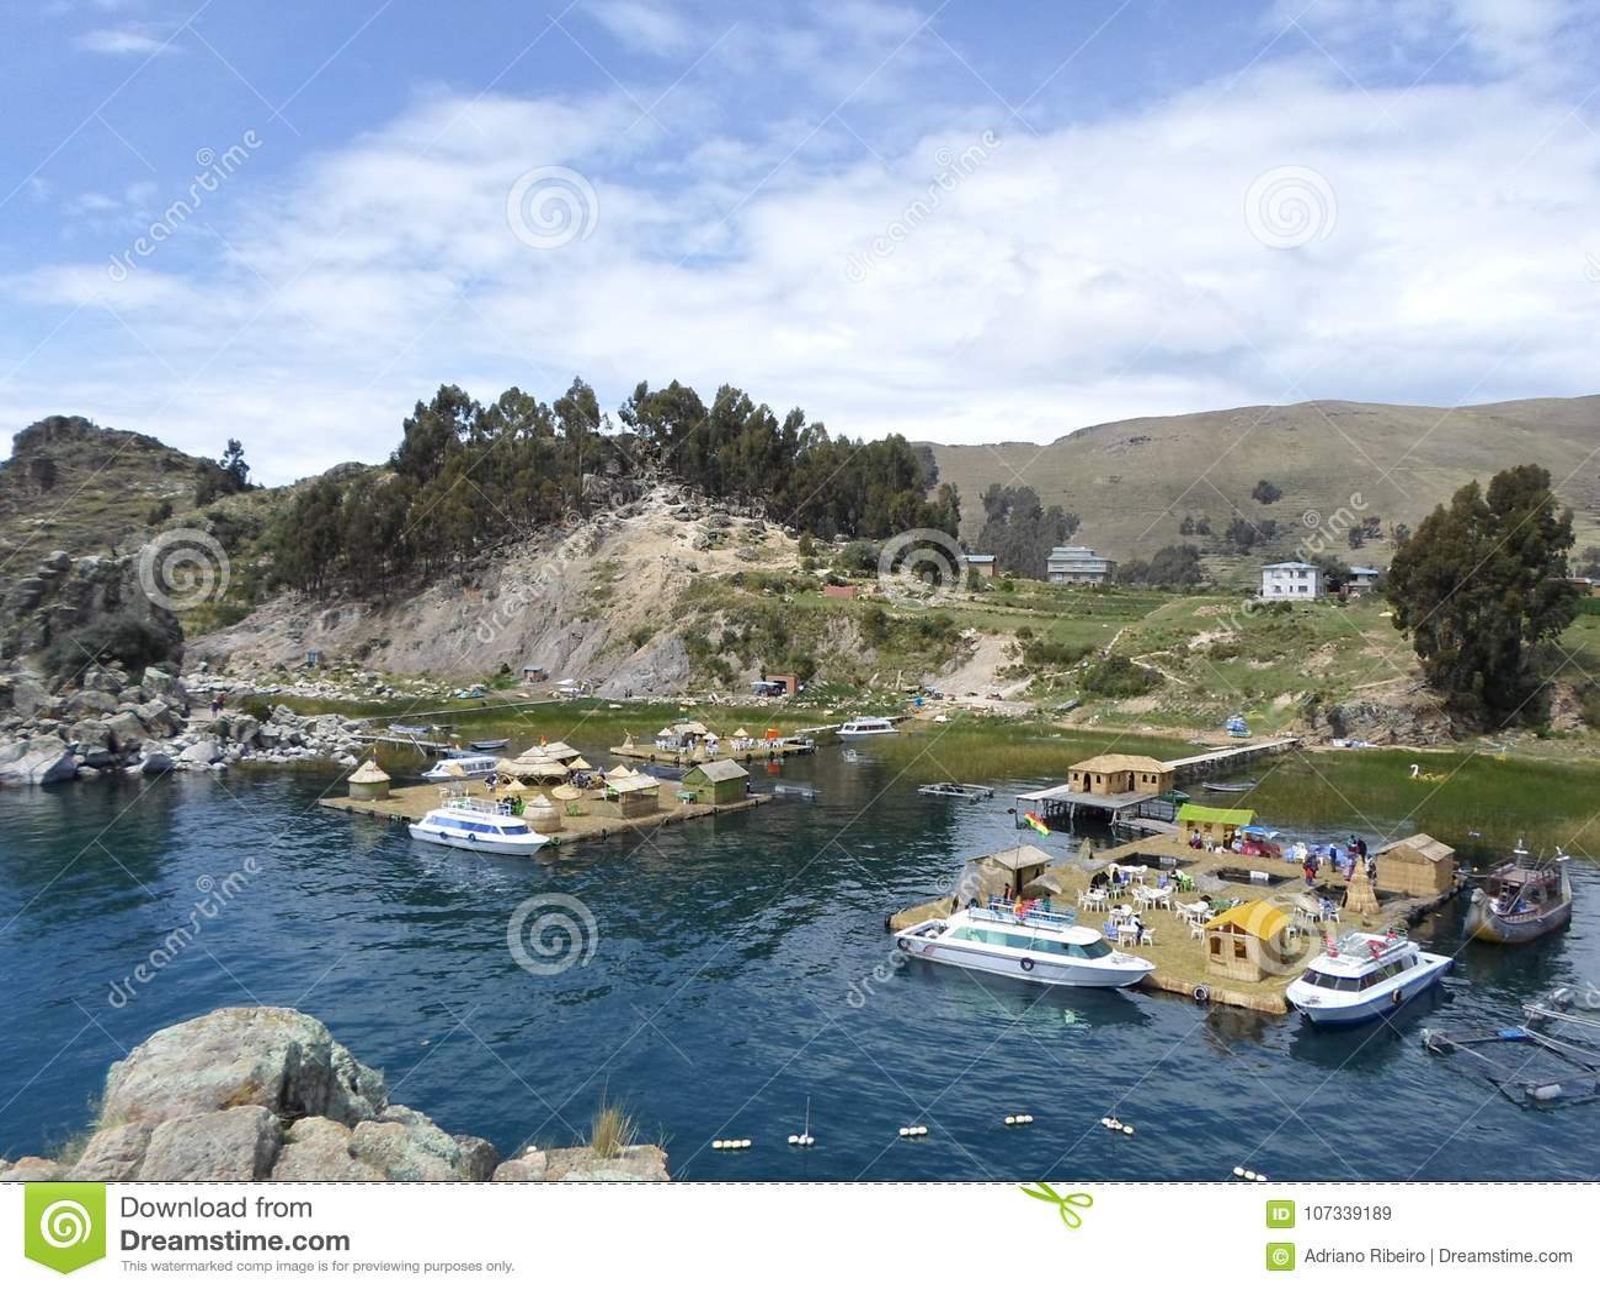 Floating islands of Lake Titicaca, Bolivia.